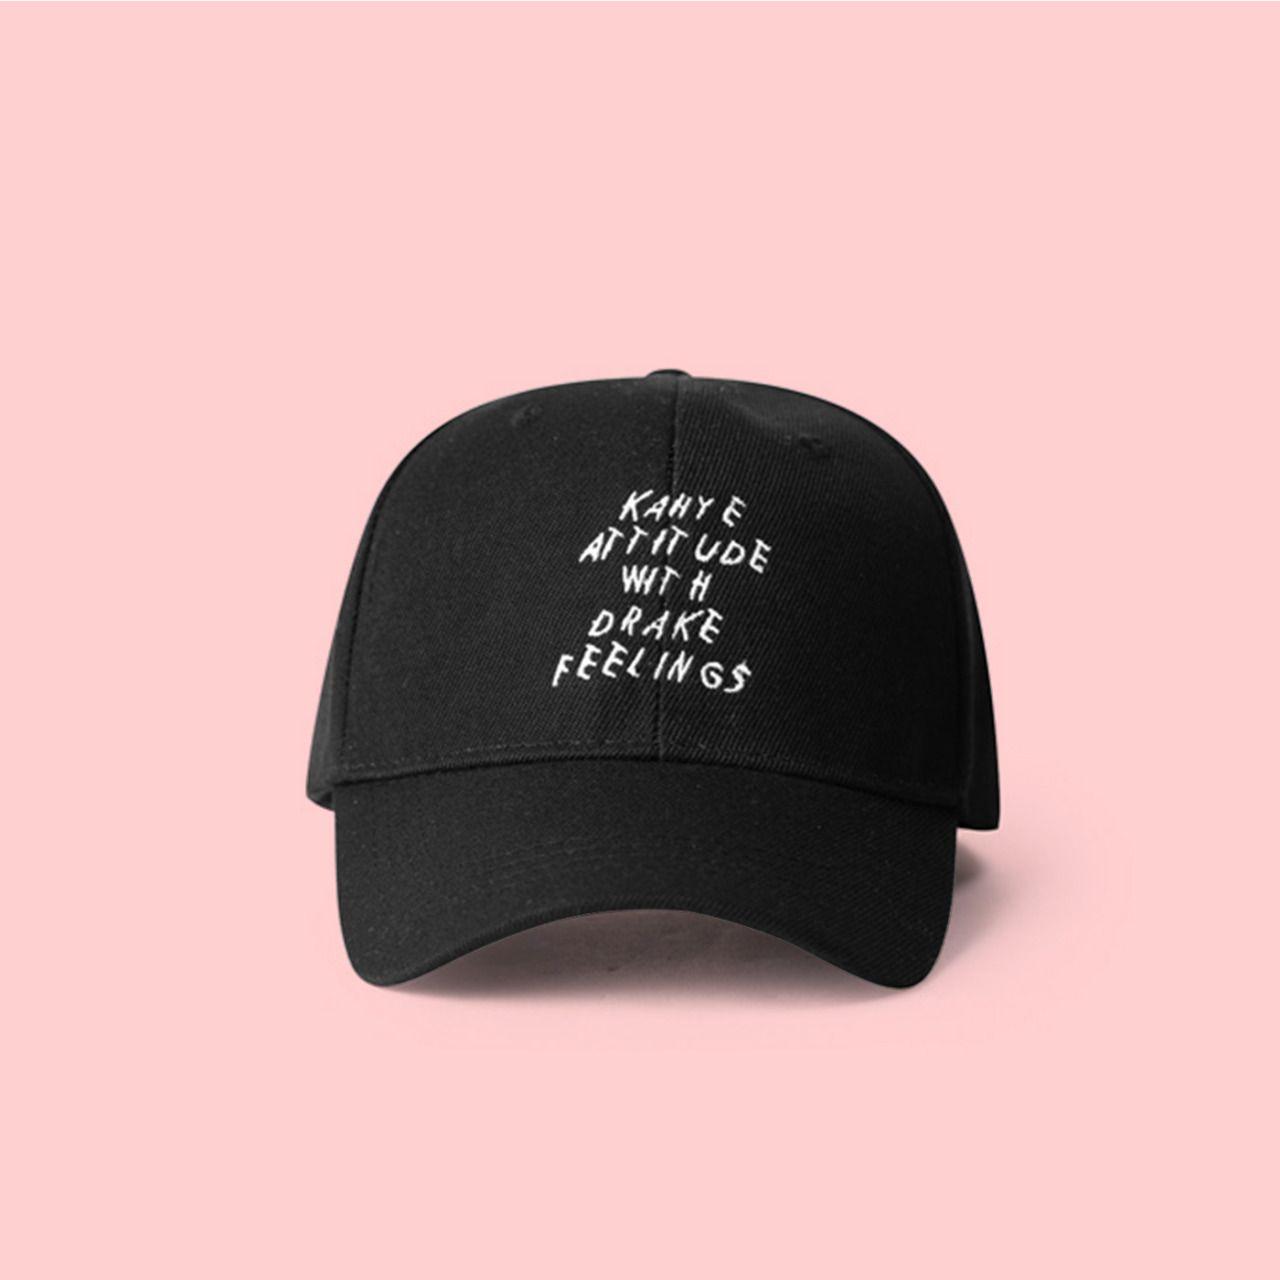 streetwear hats  a481bab0ec2